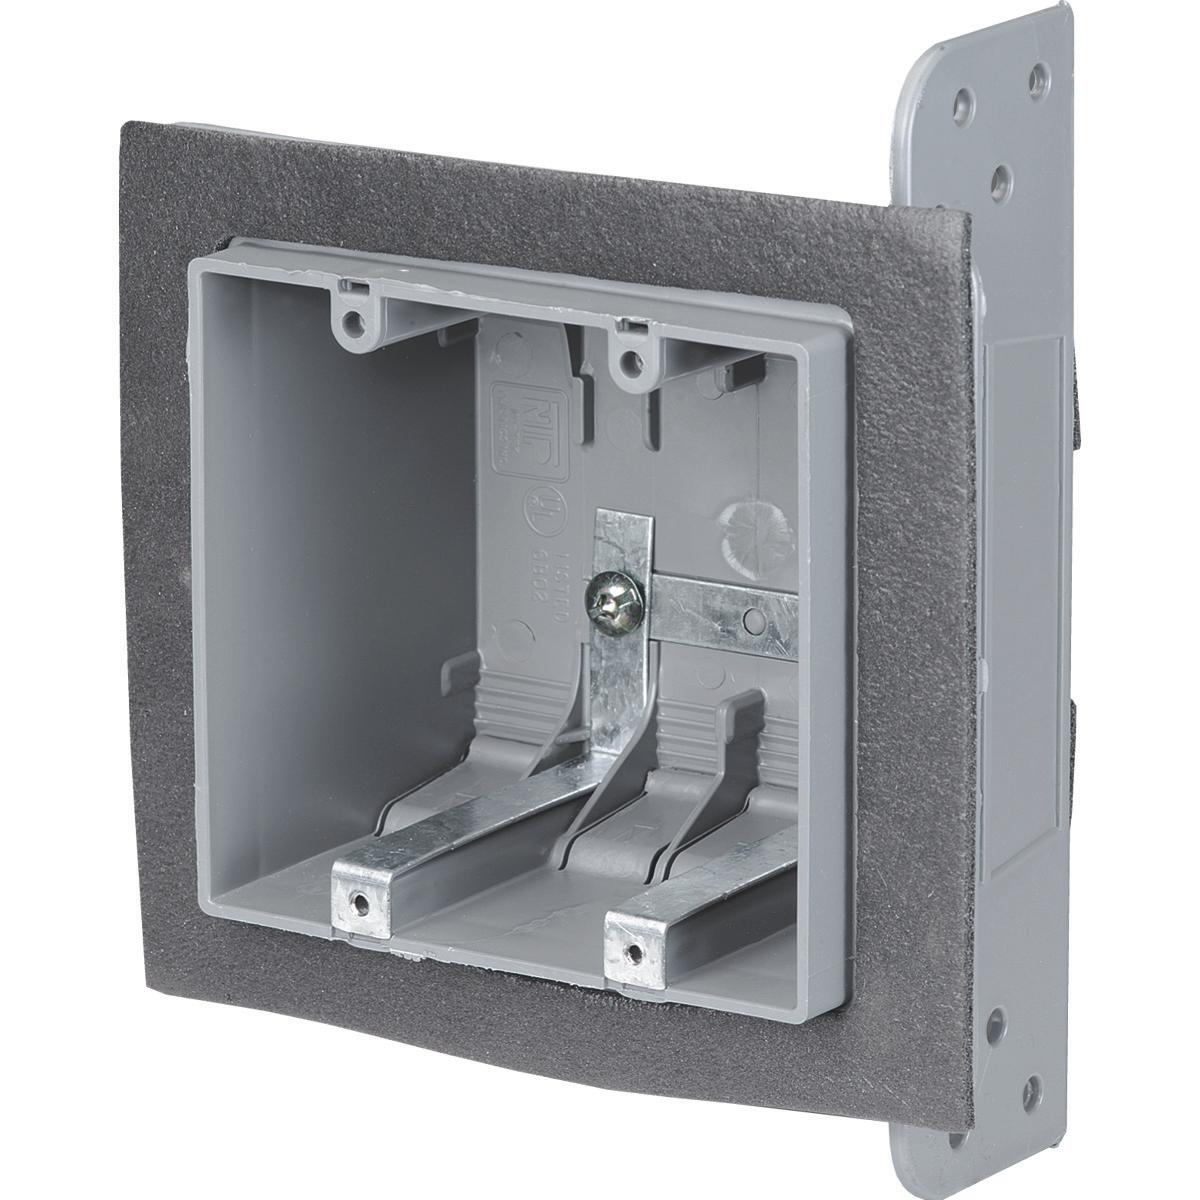 NU 2-FWSW-US TWO GANG AIRTIGHT BOX